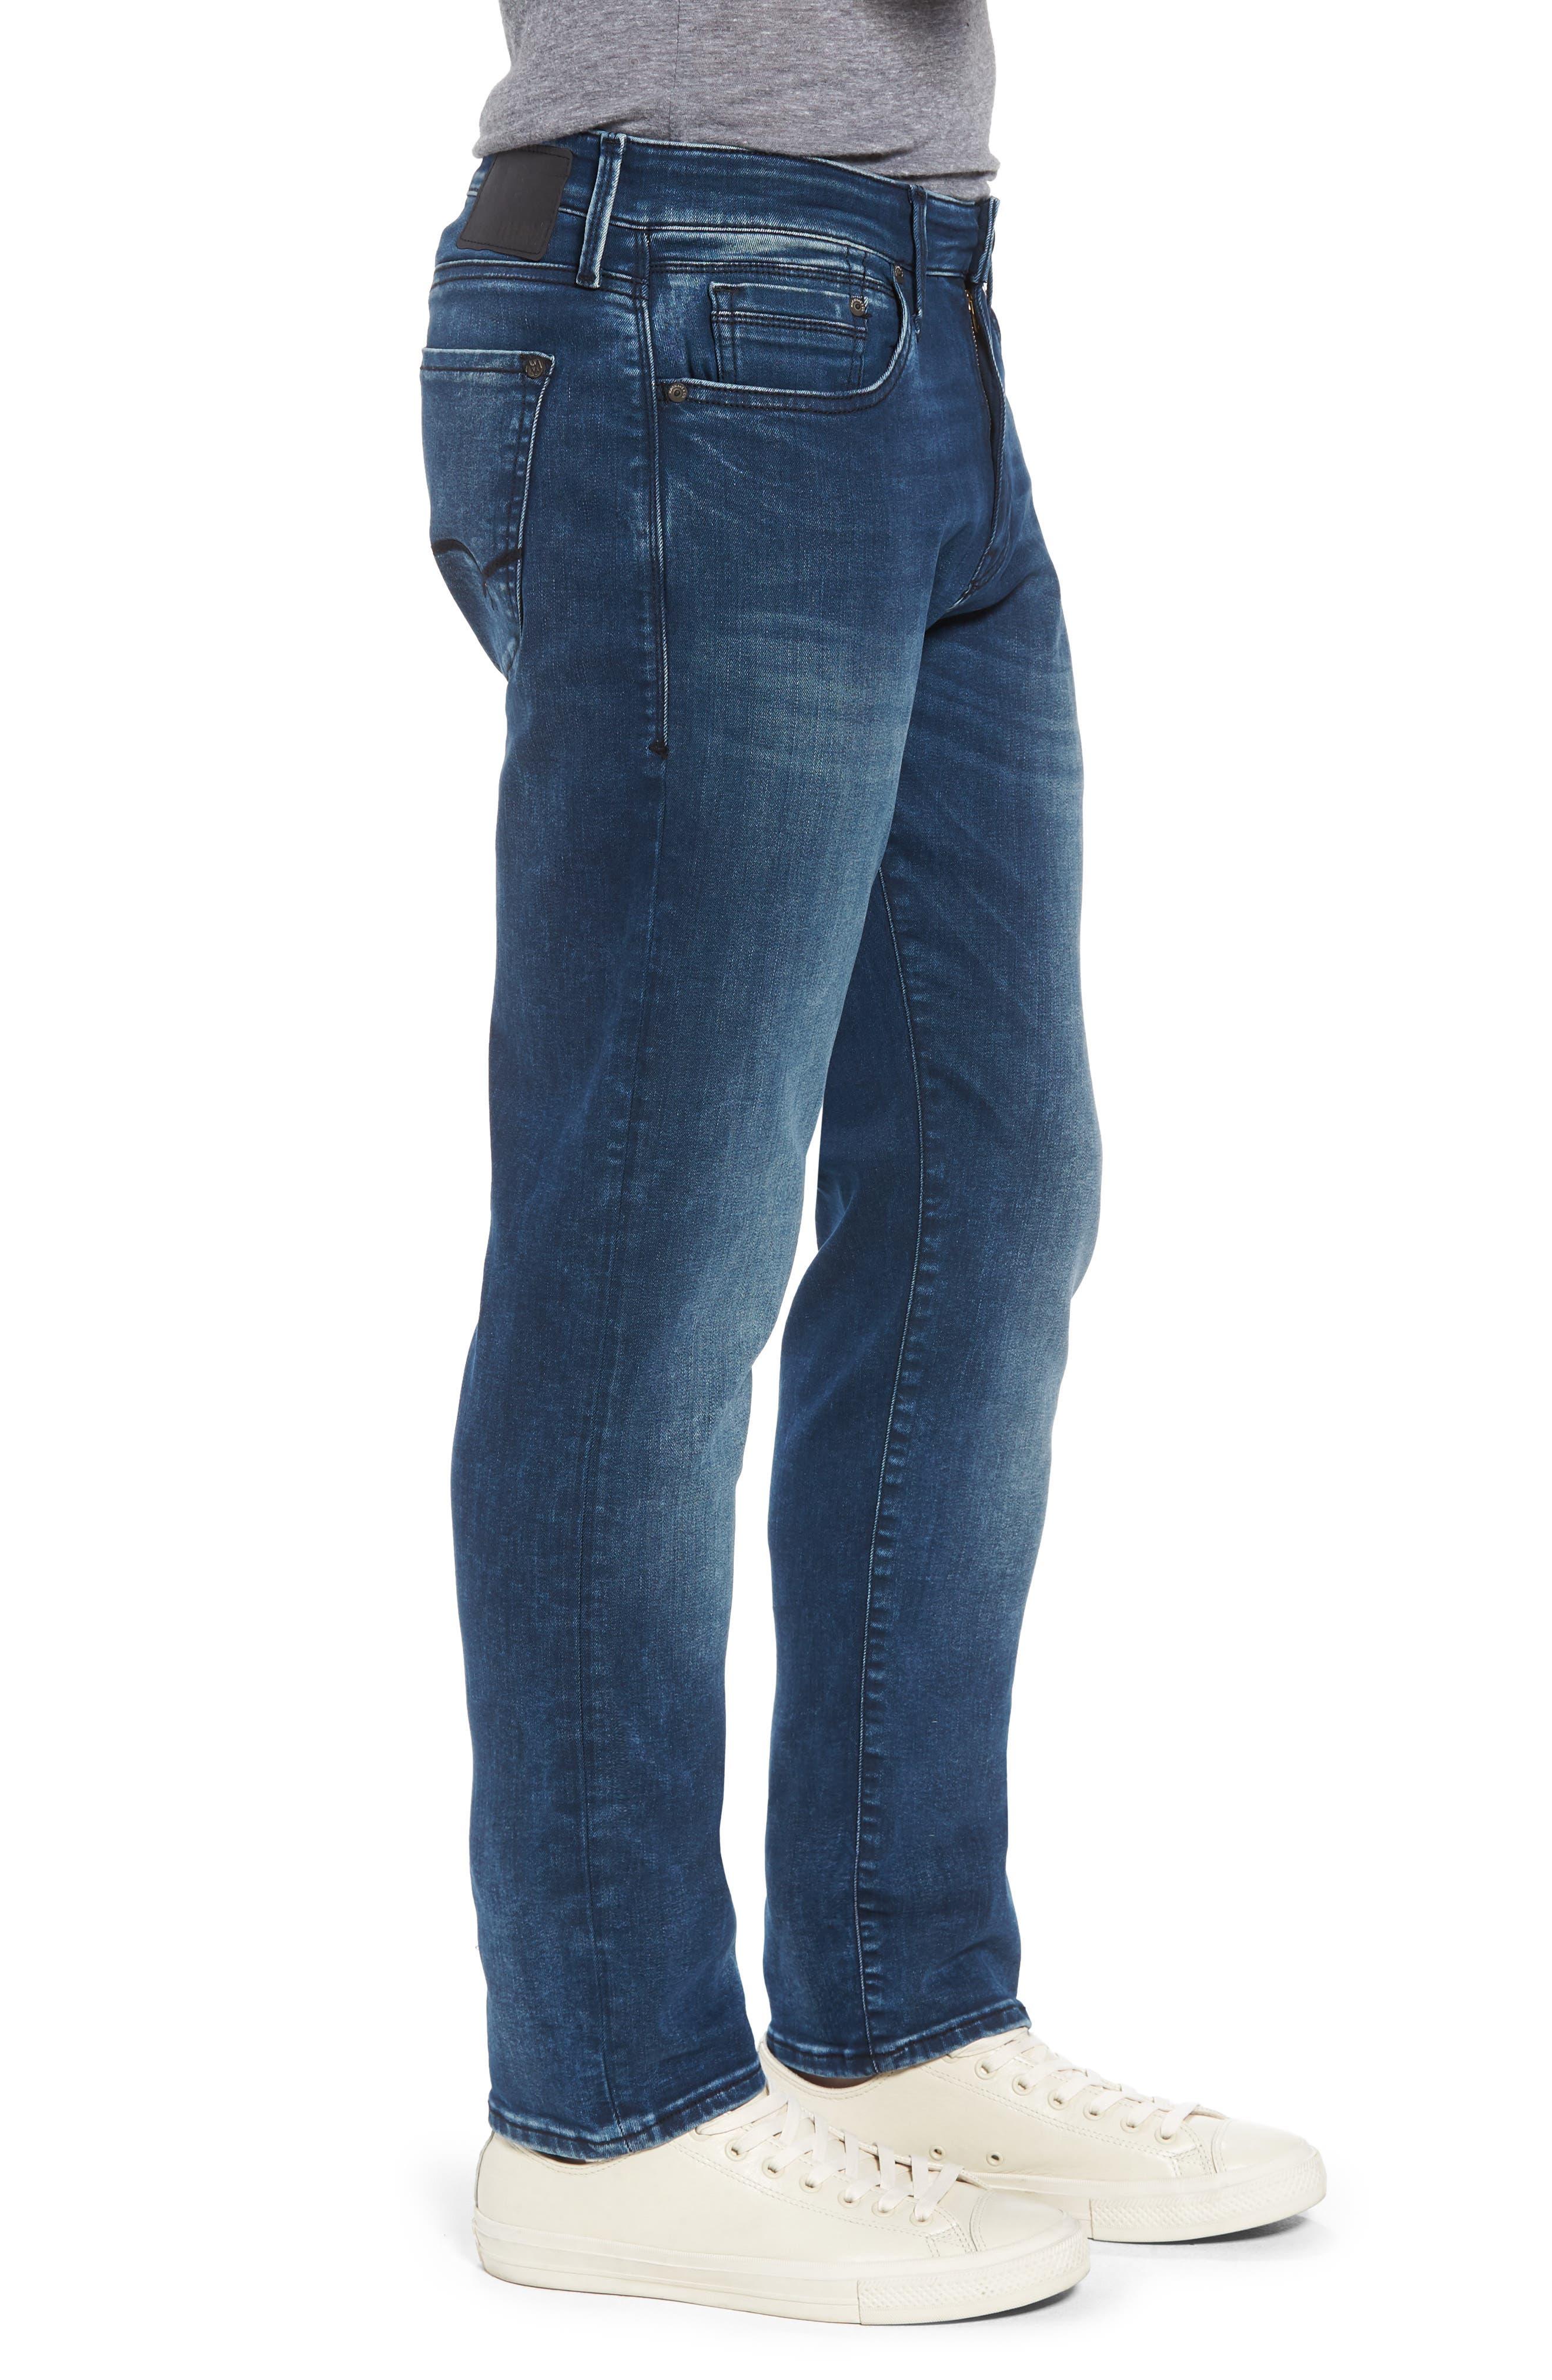 Marcus Slim Straight Leg Jeans,                             Alternate thumbnail 3, color,                             Forest Blue Williamsburg